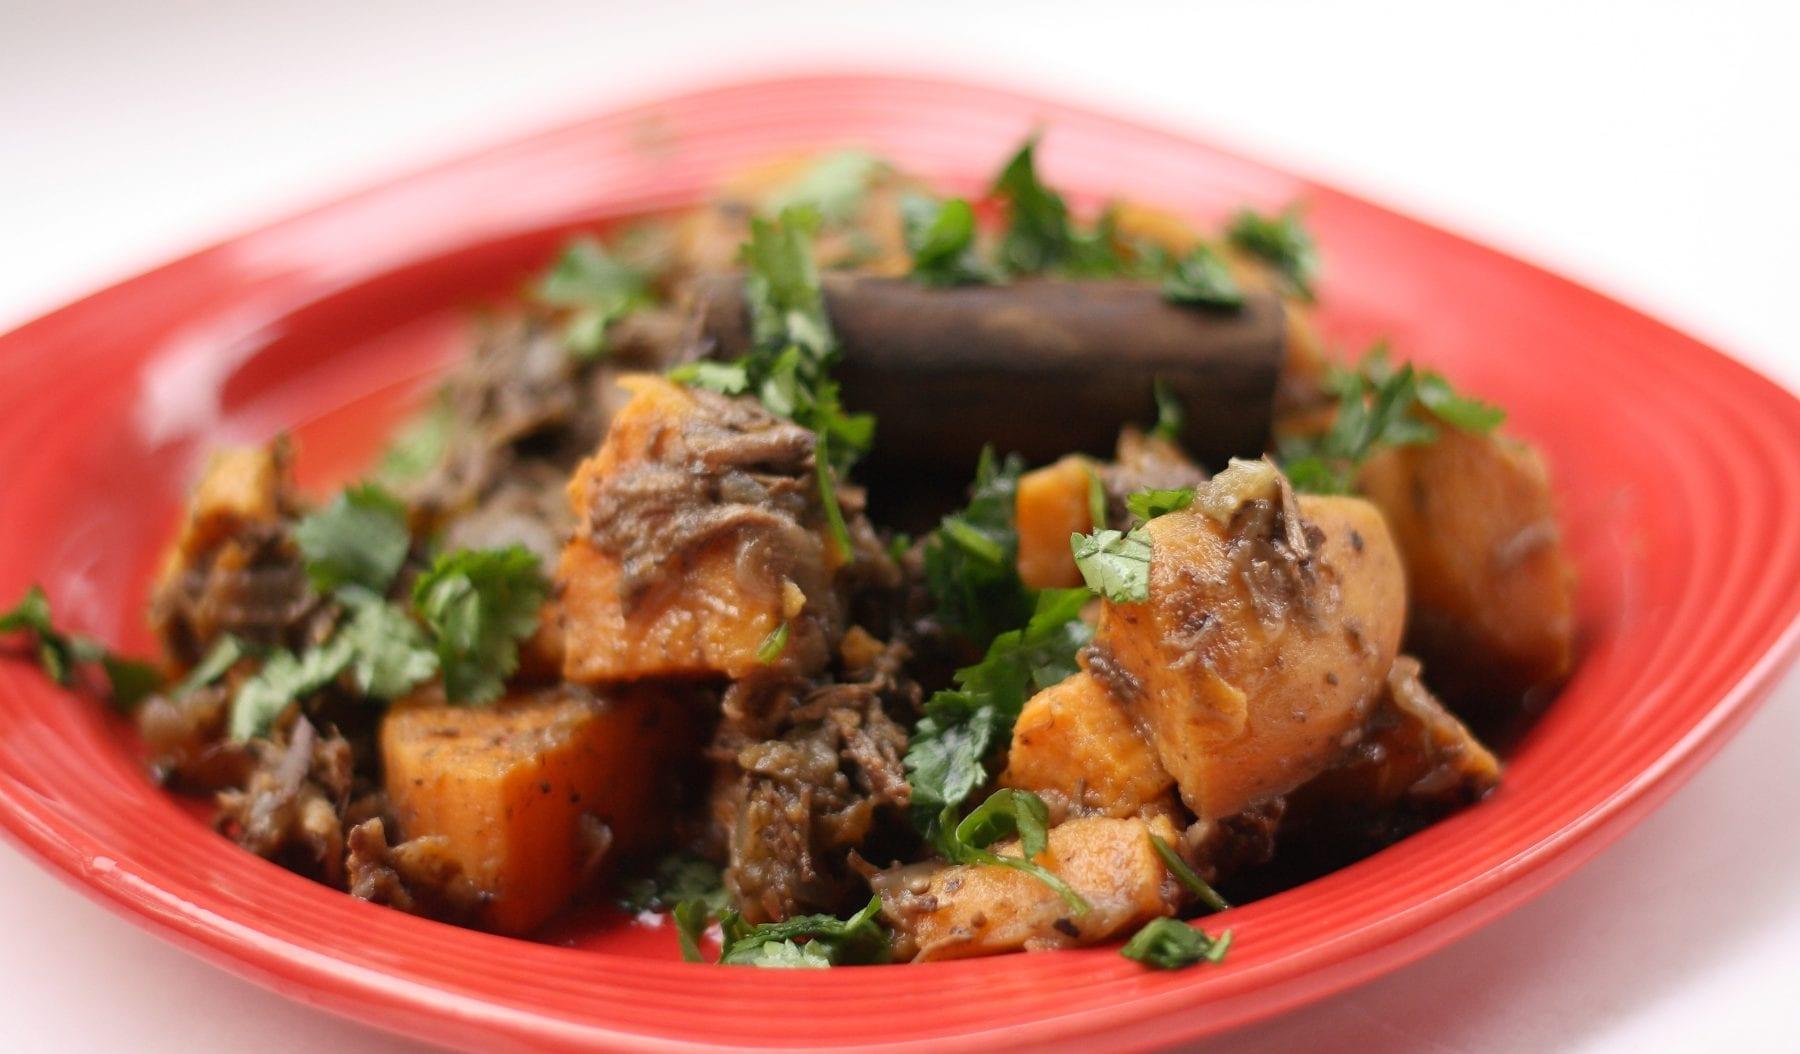 Daring Cooks November 2011 – Beef Braised in Tea with Sweet Potatoes